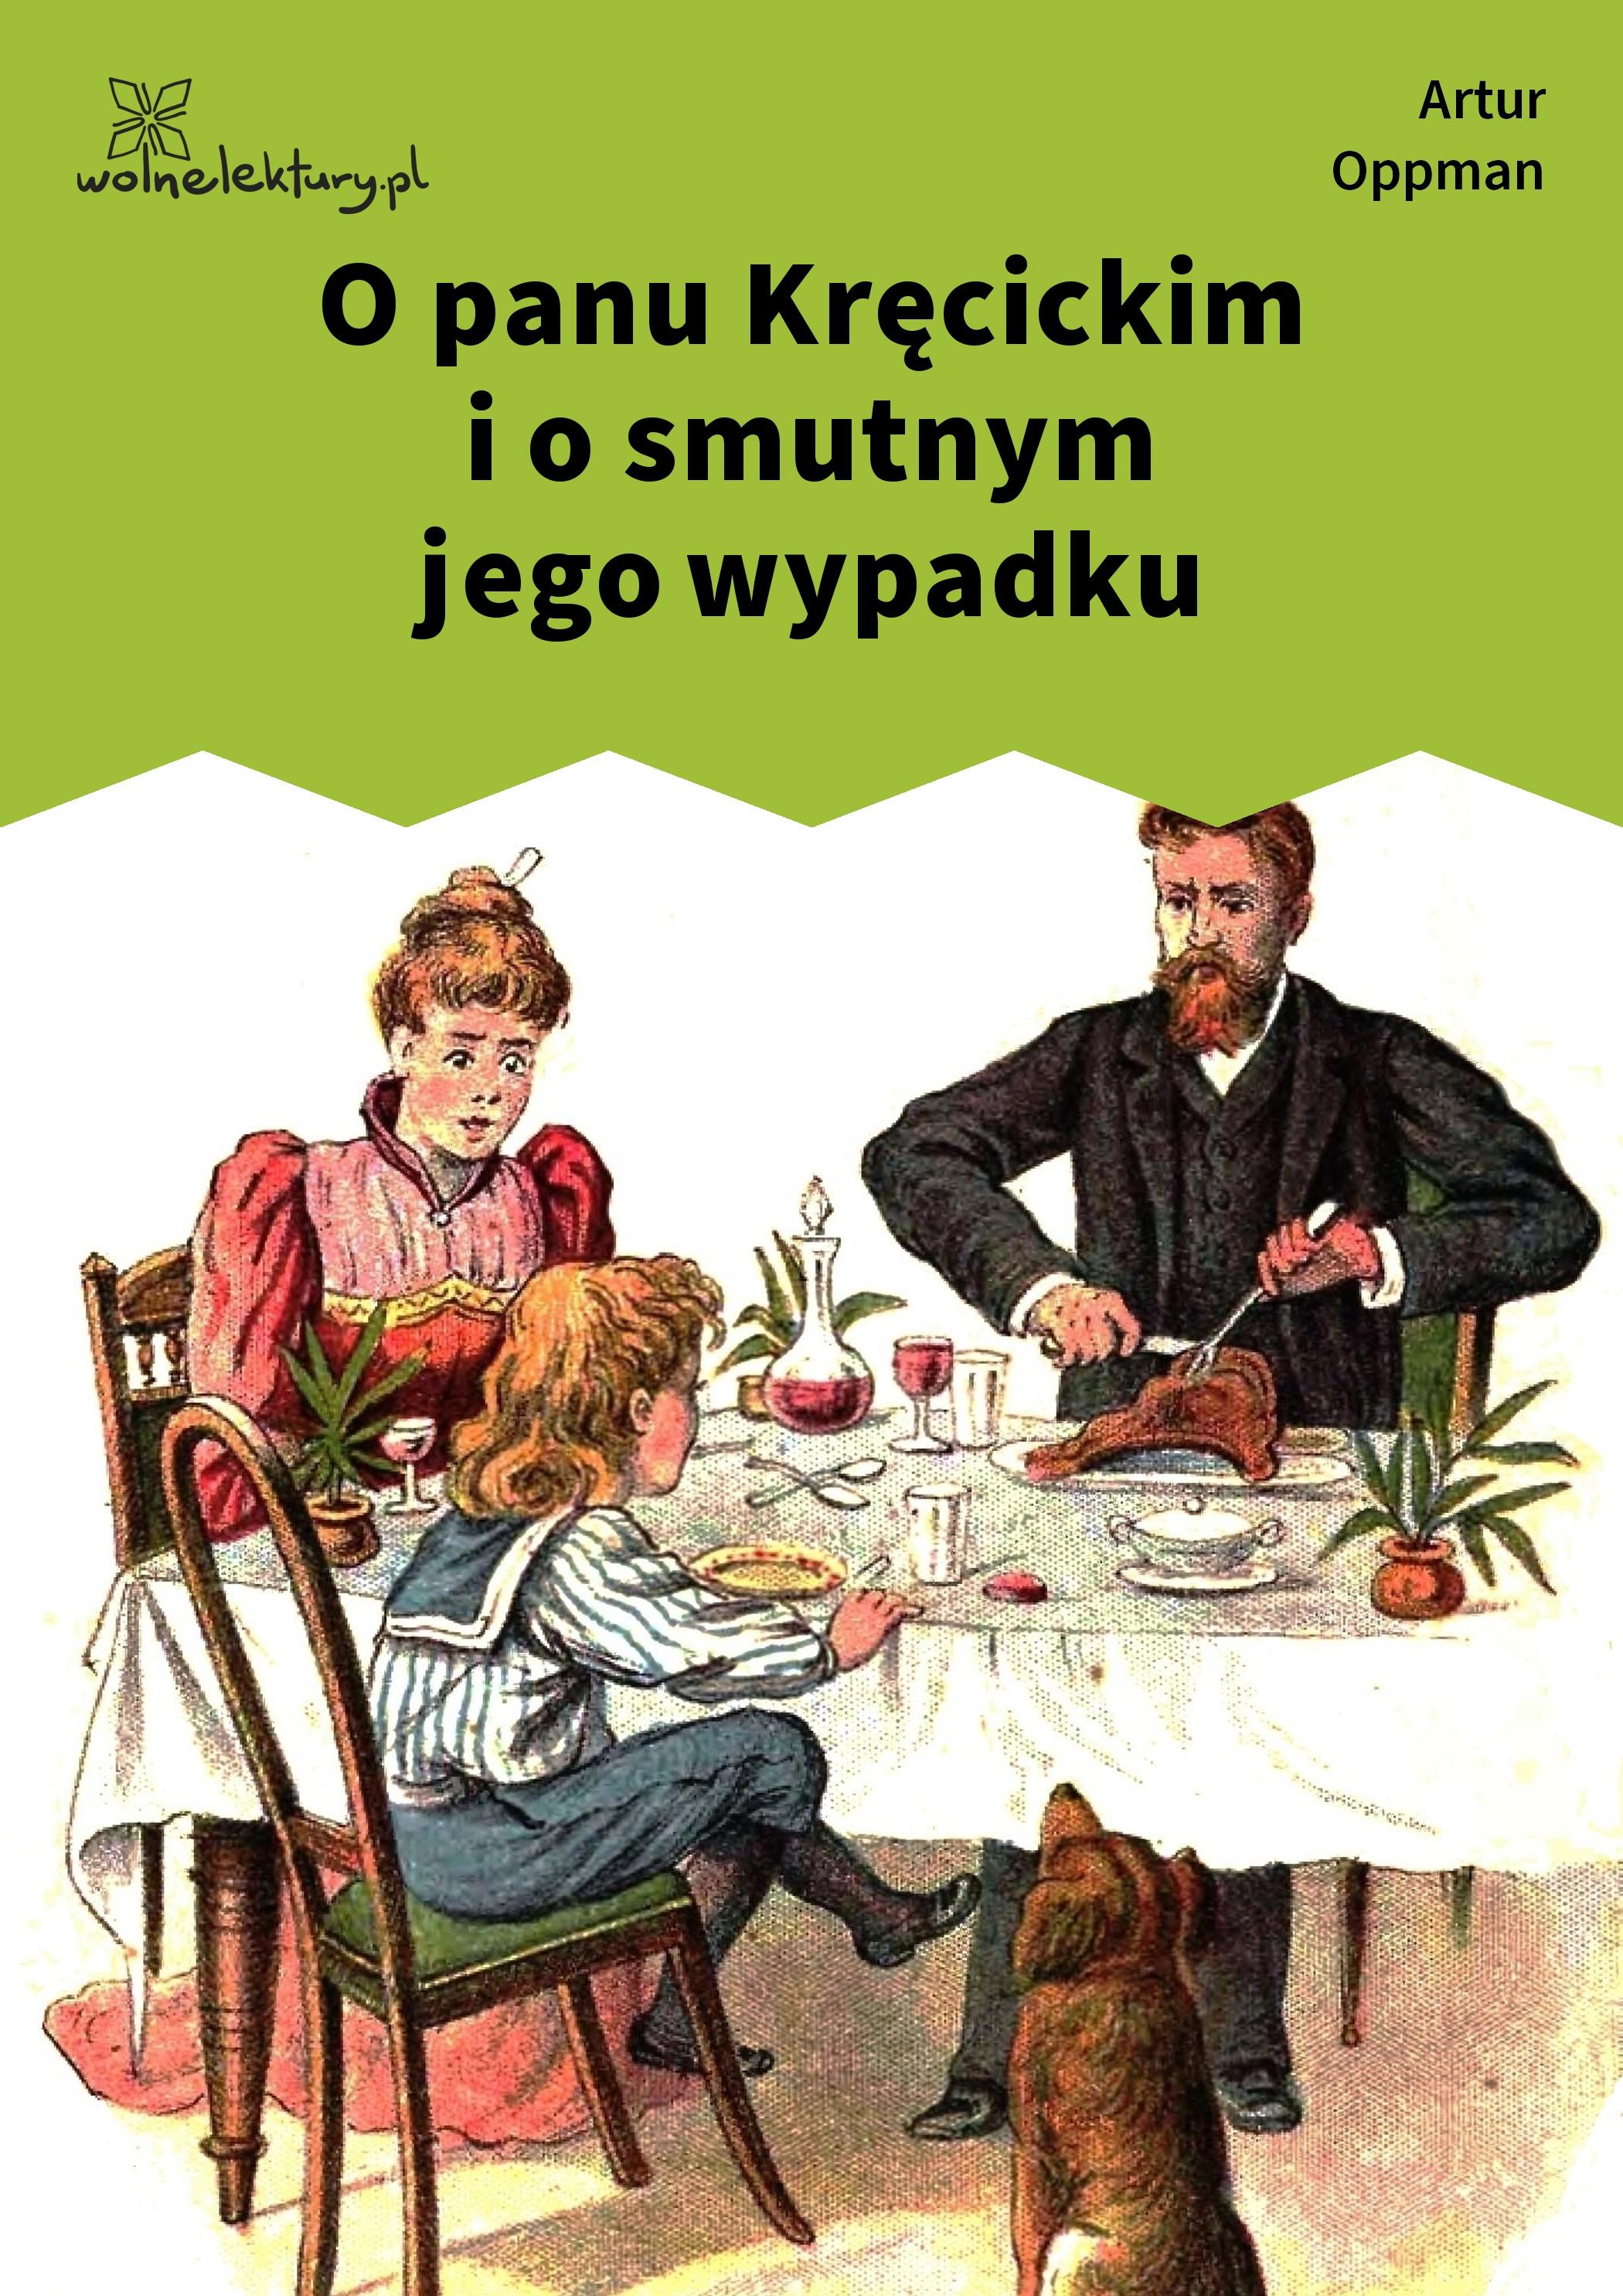 shop Lehrbuch des Strafrechts 1932